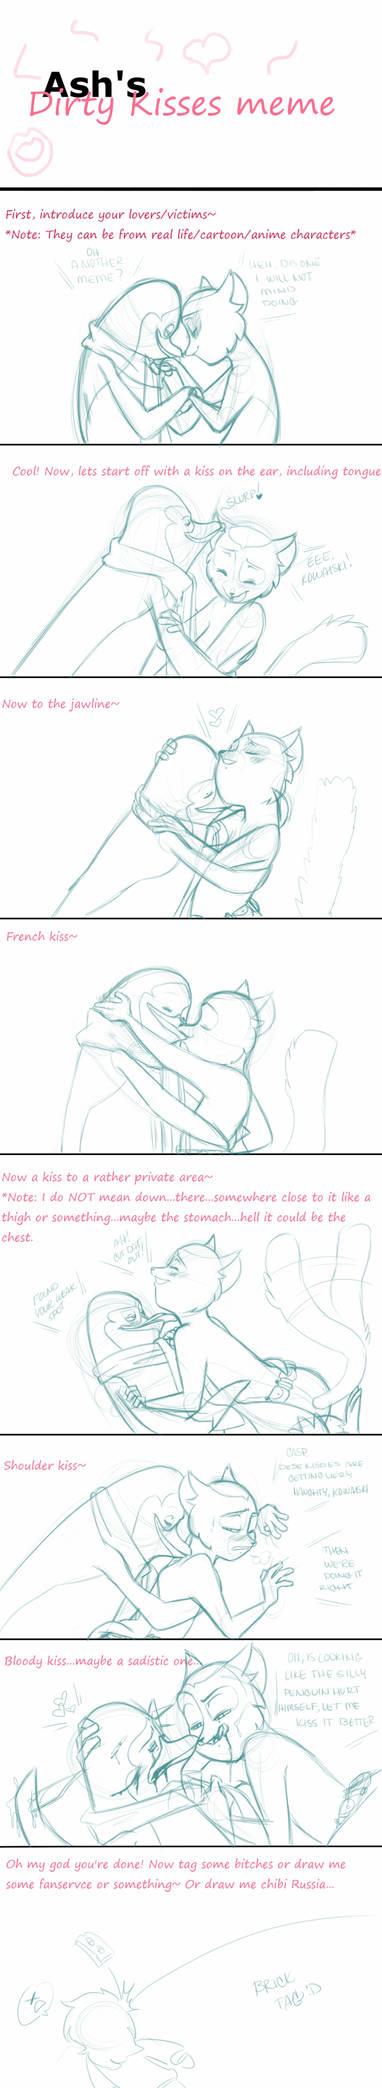 Naughty kisses meme -rough- by Tsutoshi on DeviantArt